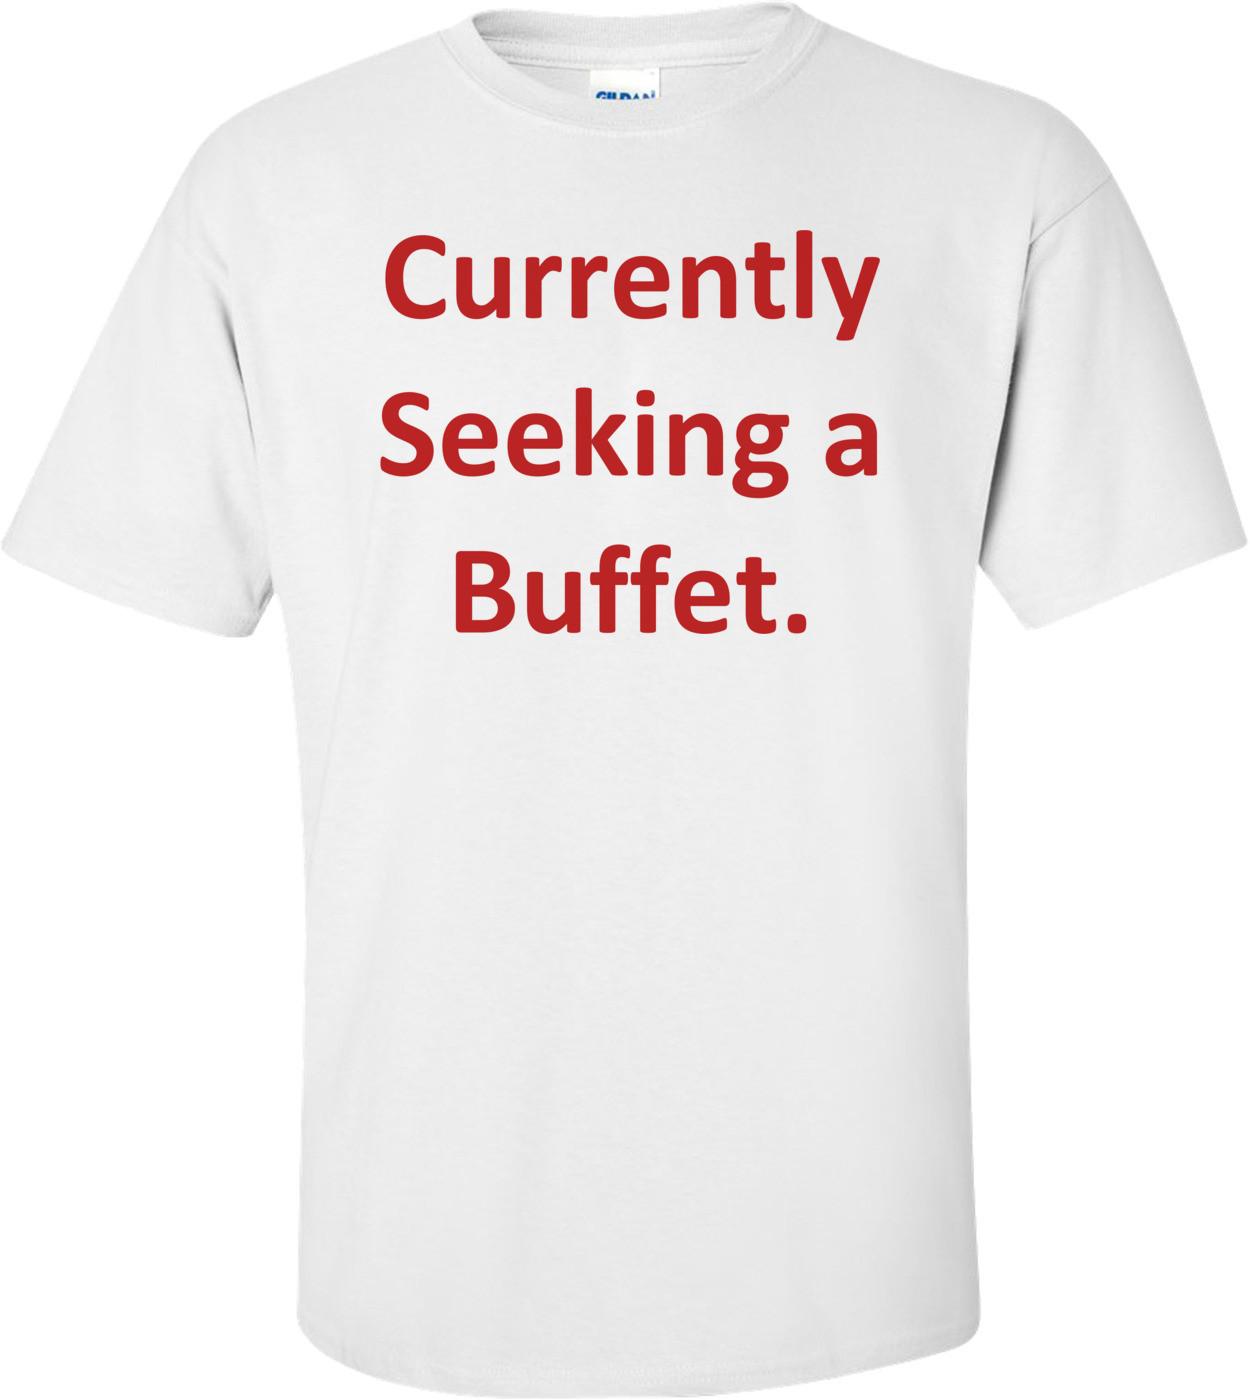 Currently Seeking a Buffet. Shirt